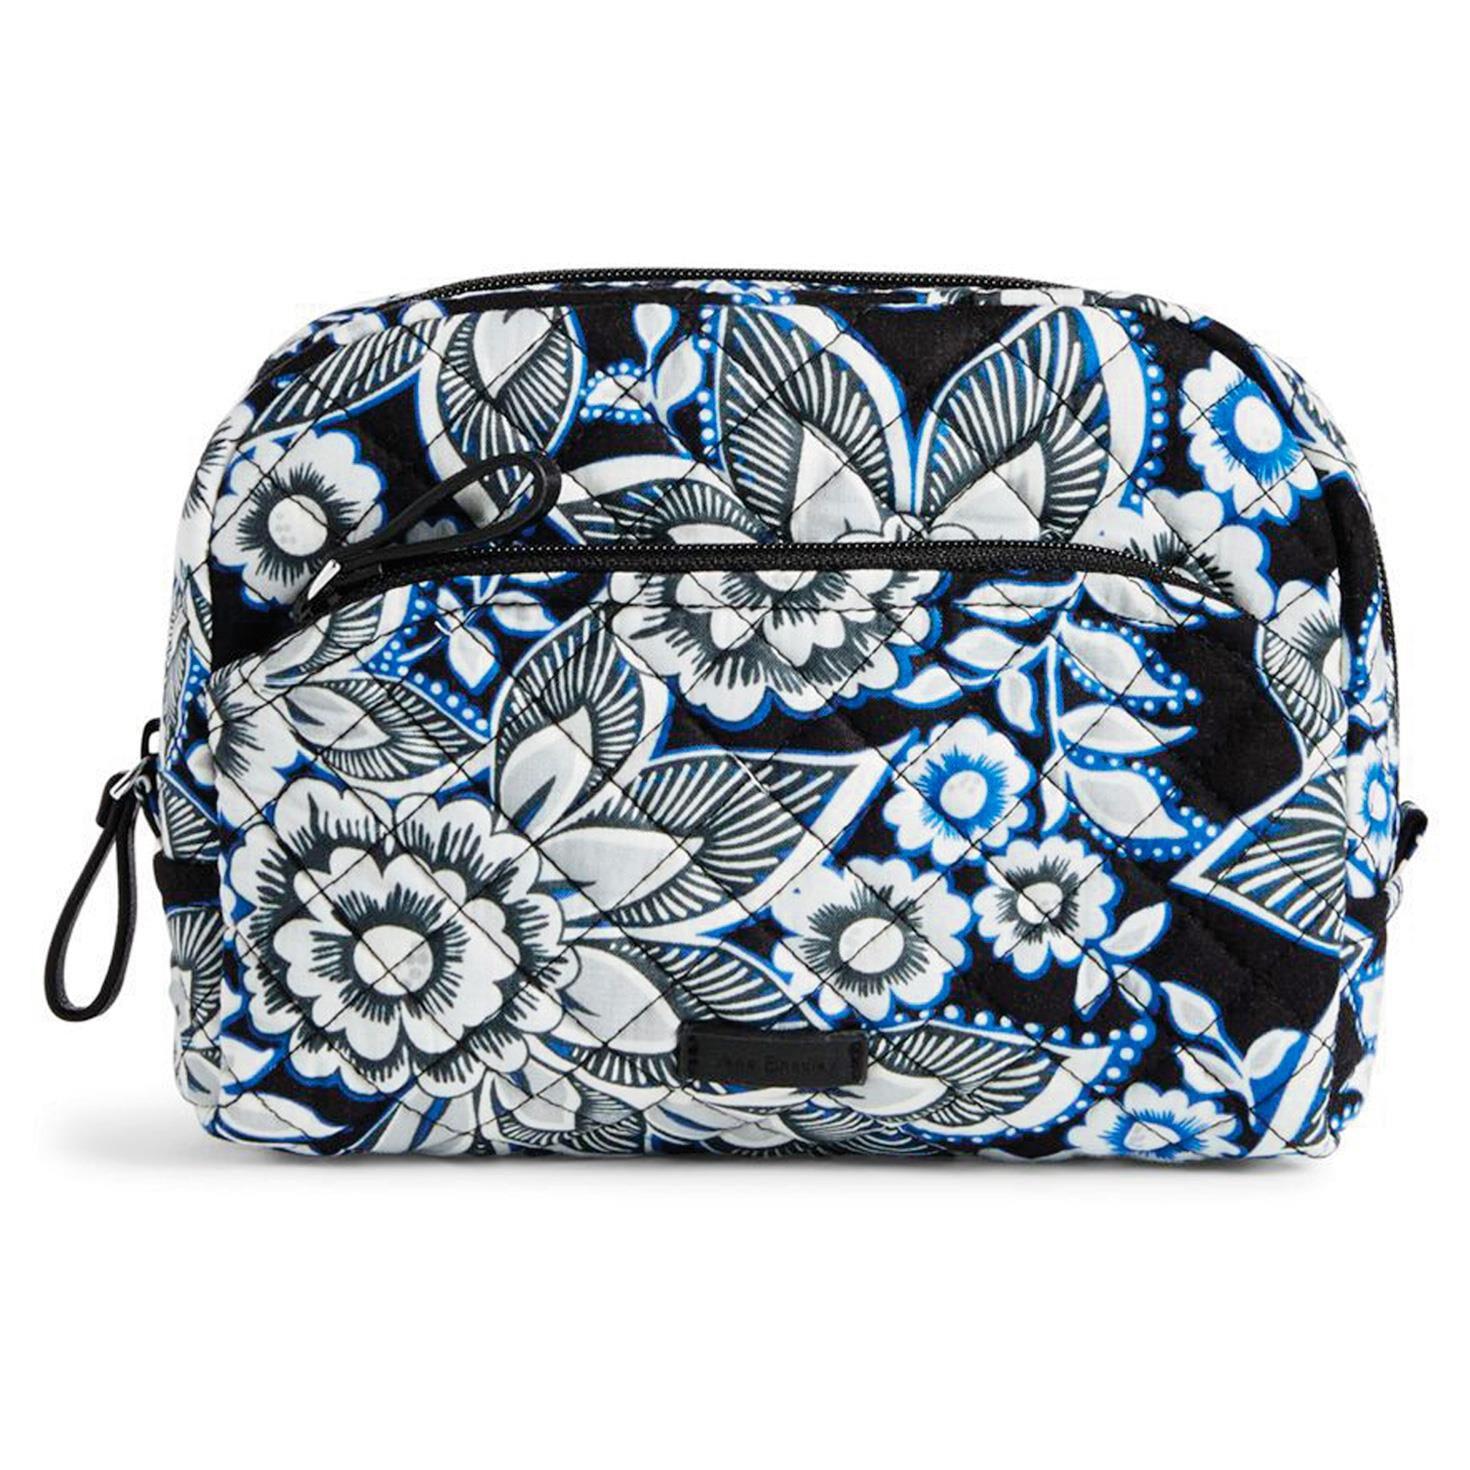 Vera Bradley Iconic Medium Cosmetic Bag In Snow Lotus Travel Hallmark